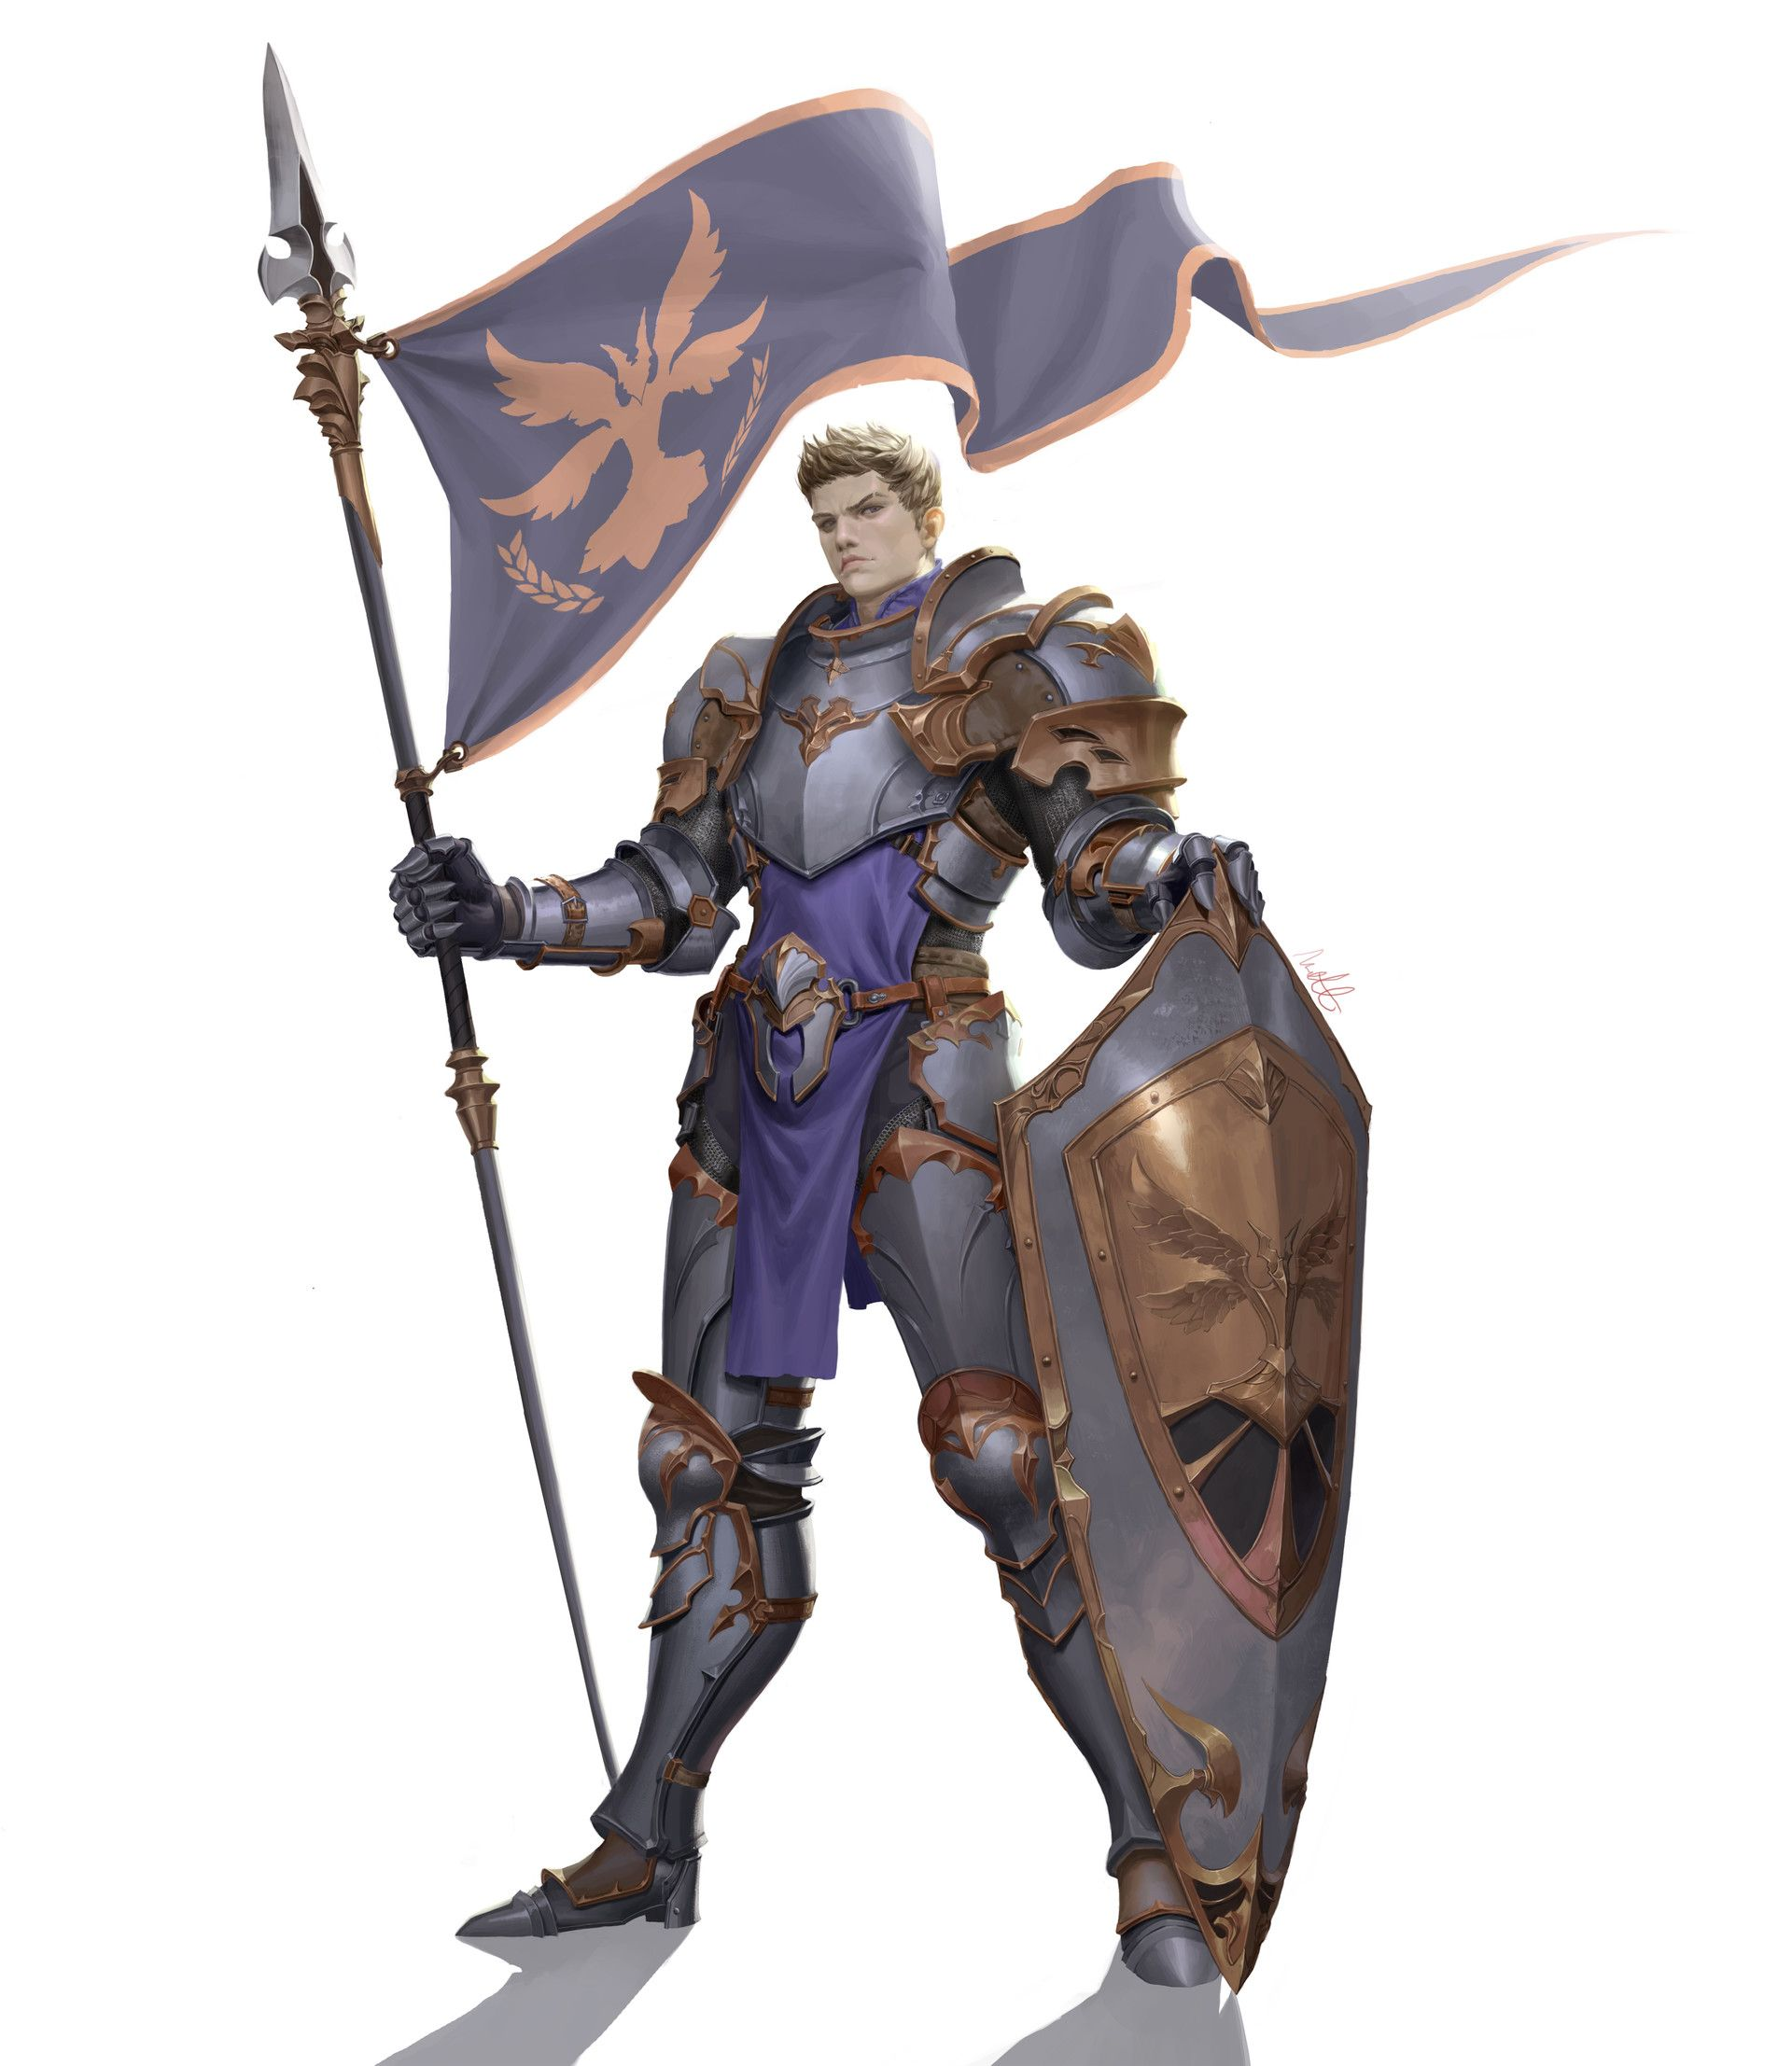 ArtStation shield flag knight man, Gwangbeom Kho